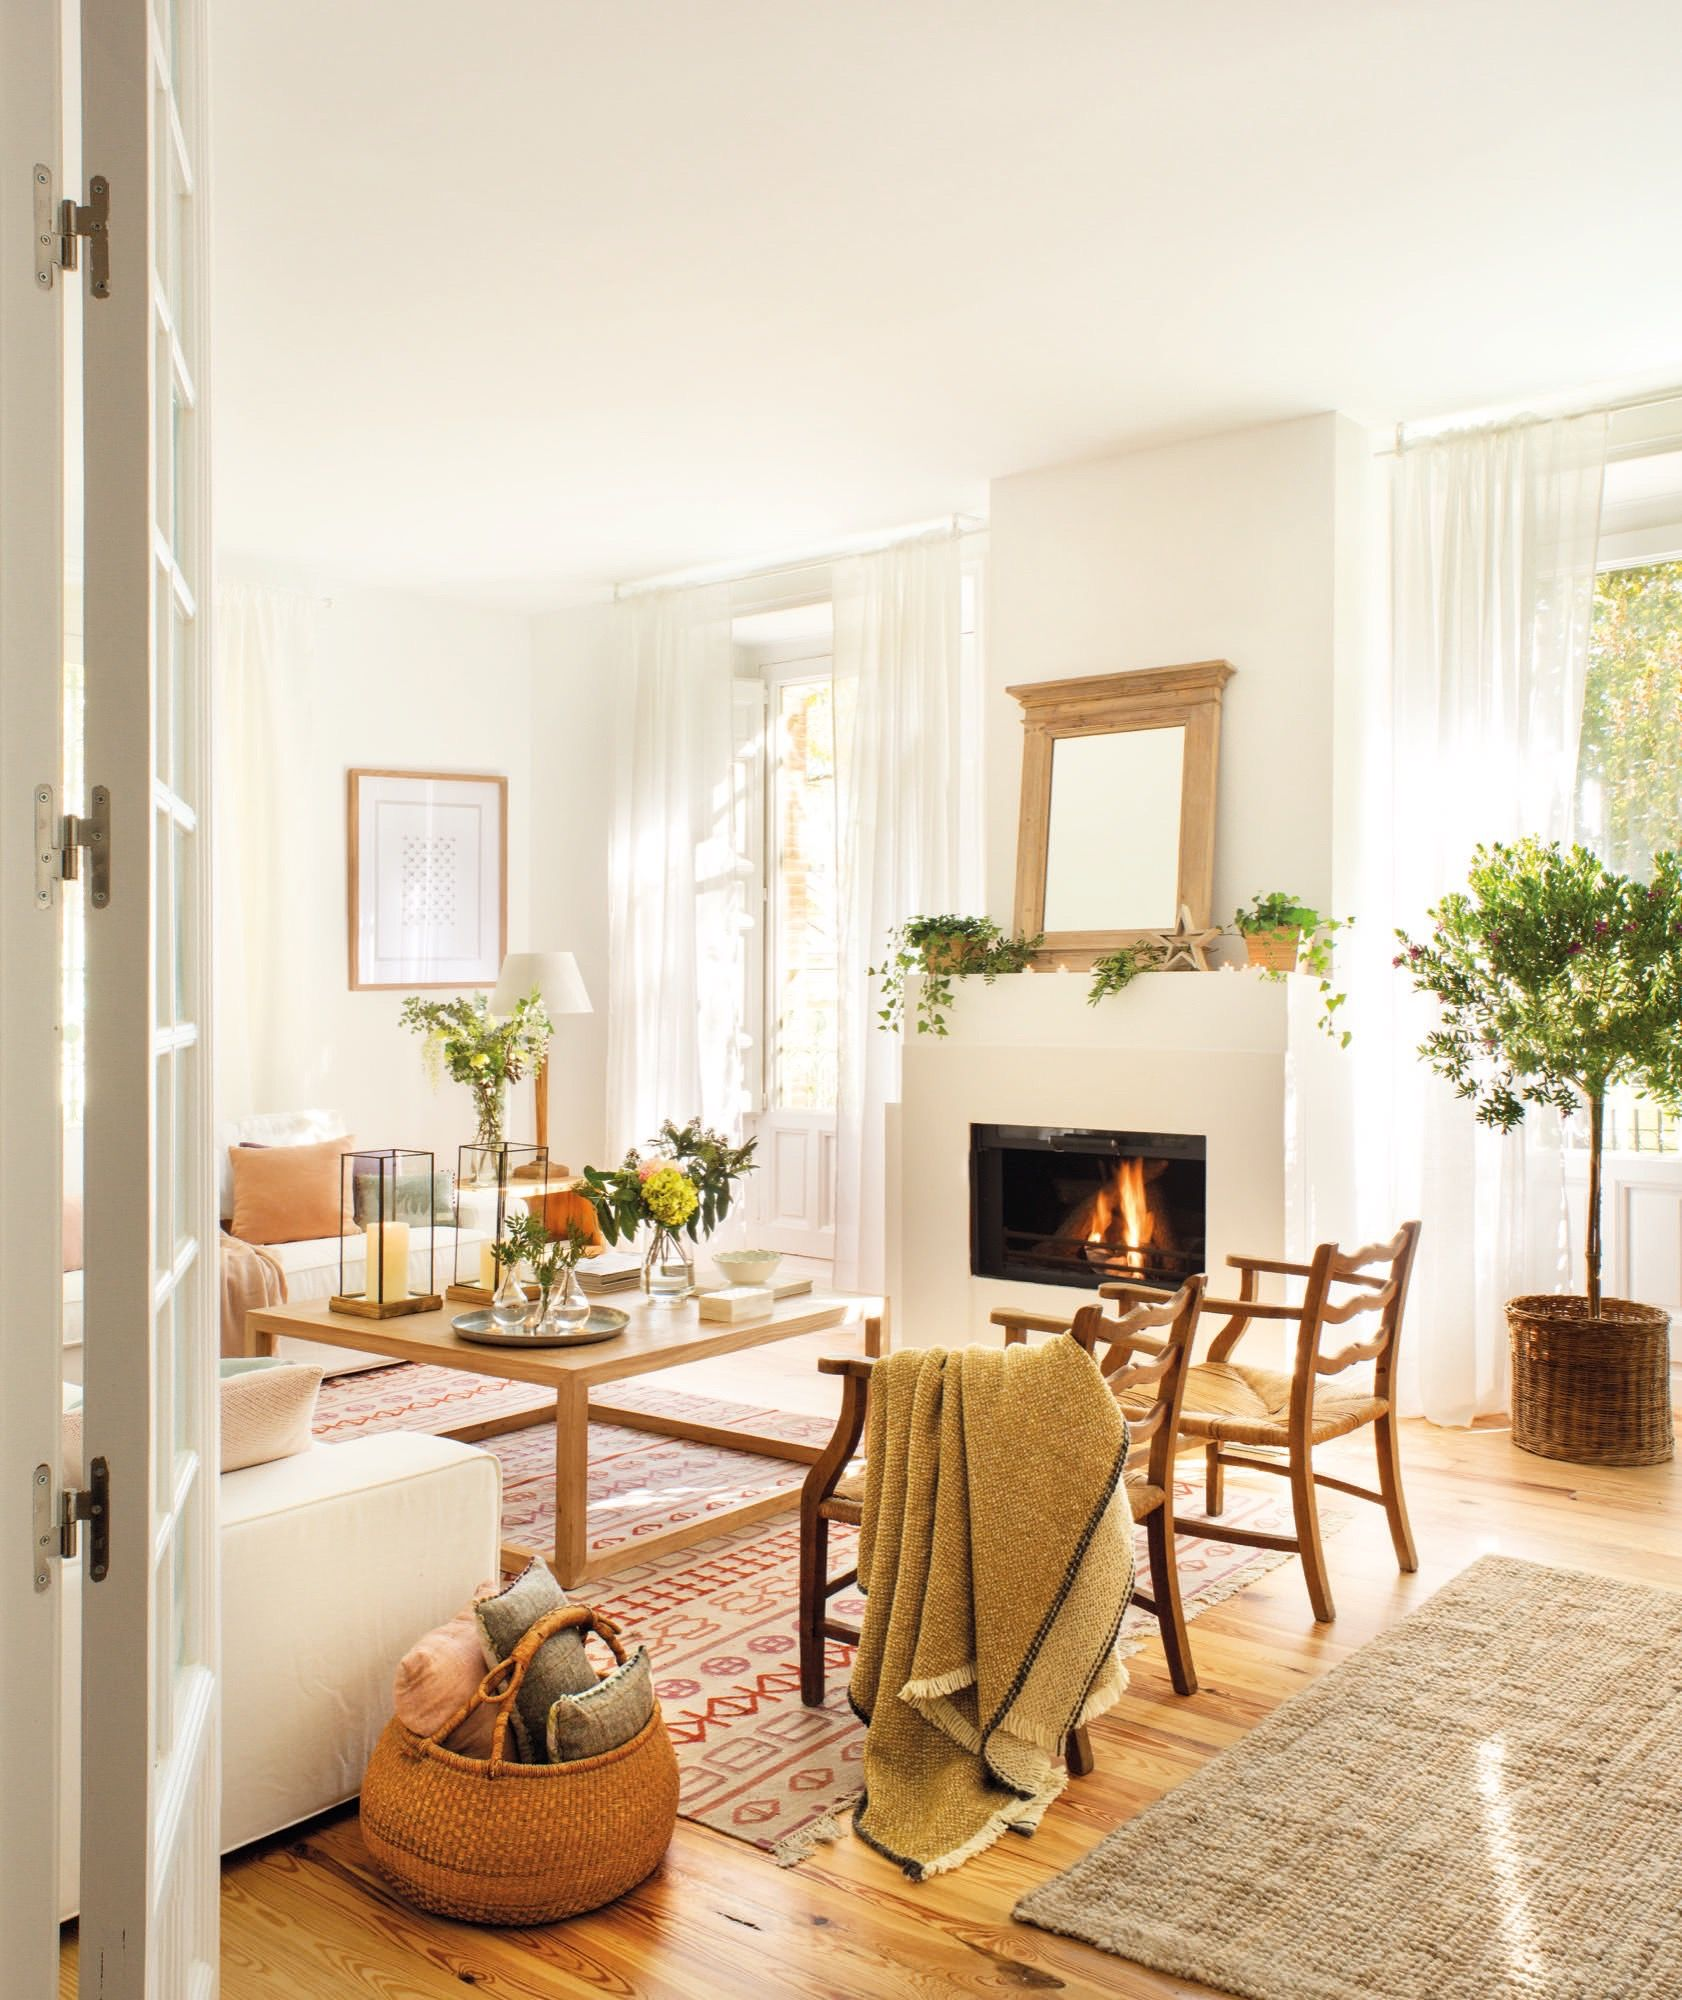 Salon con butacas mesa de centro y chimenea pisos - Chimeneas para pisos ...